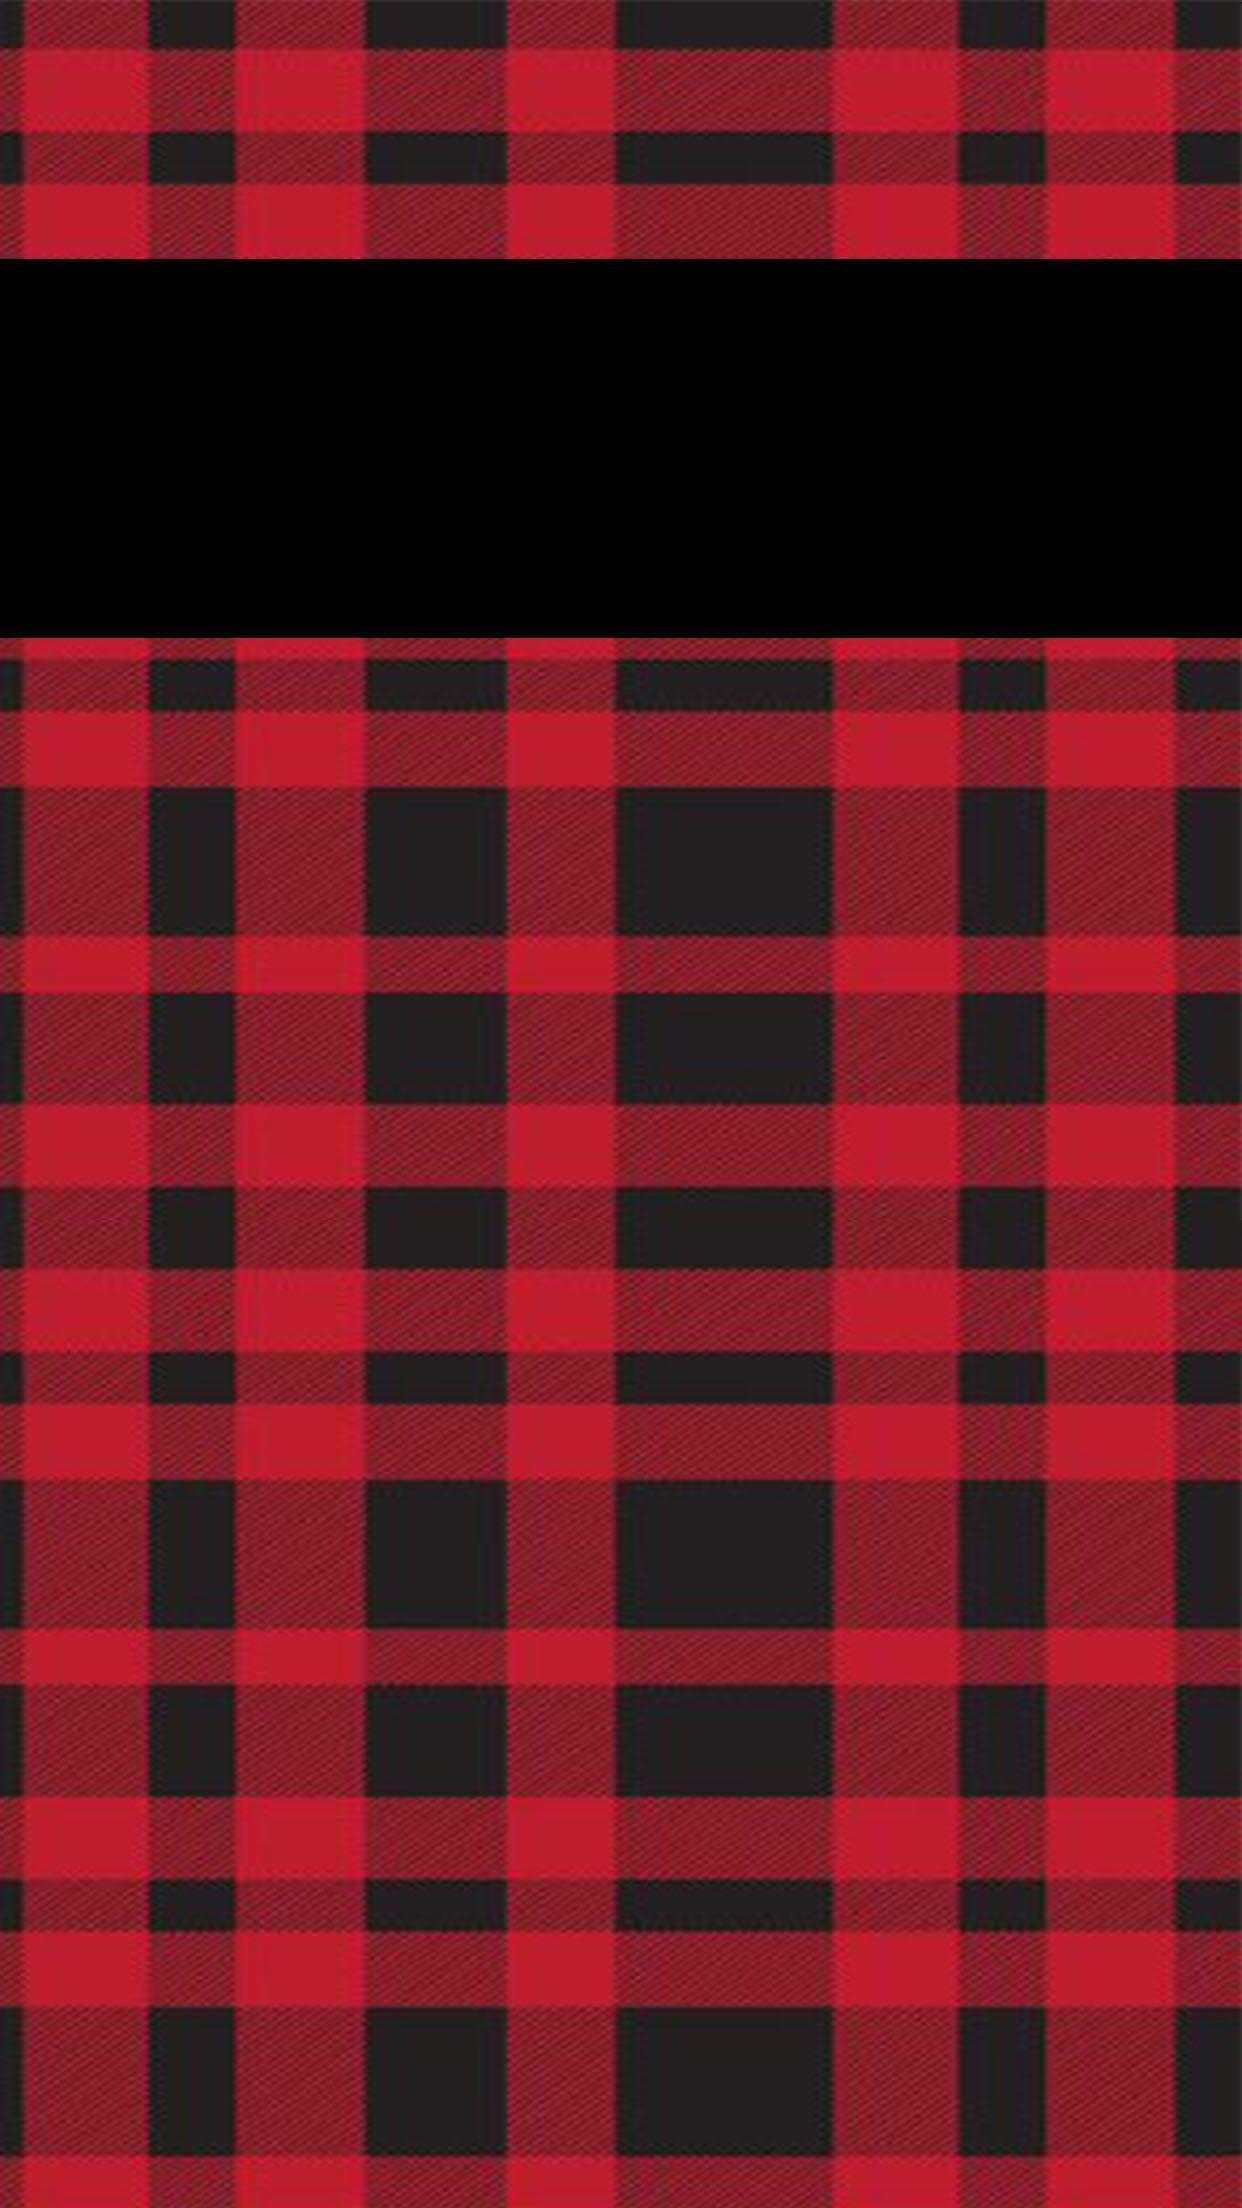 Buffalo Plaid Lock Screen Plaid wallpaper Holiday iphone 1242x2208